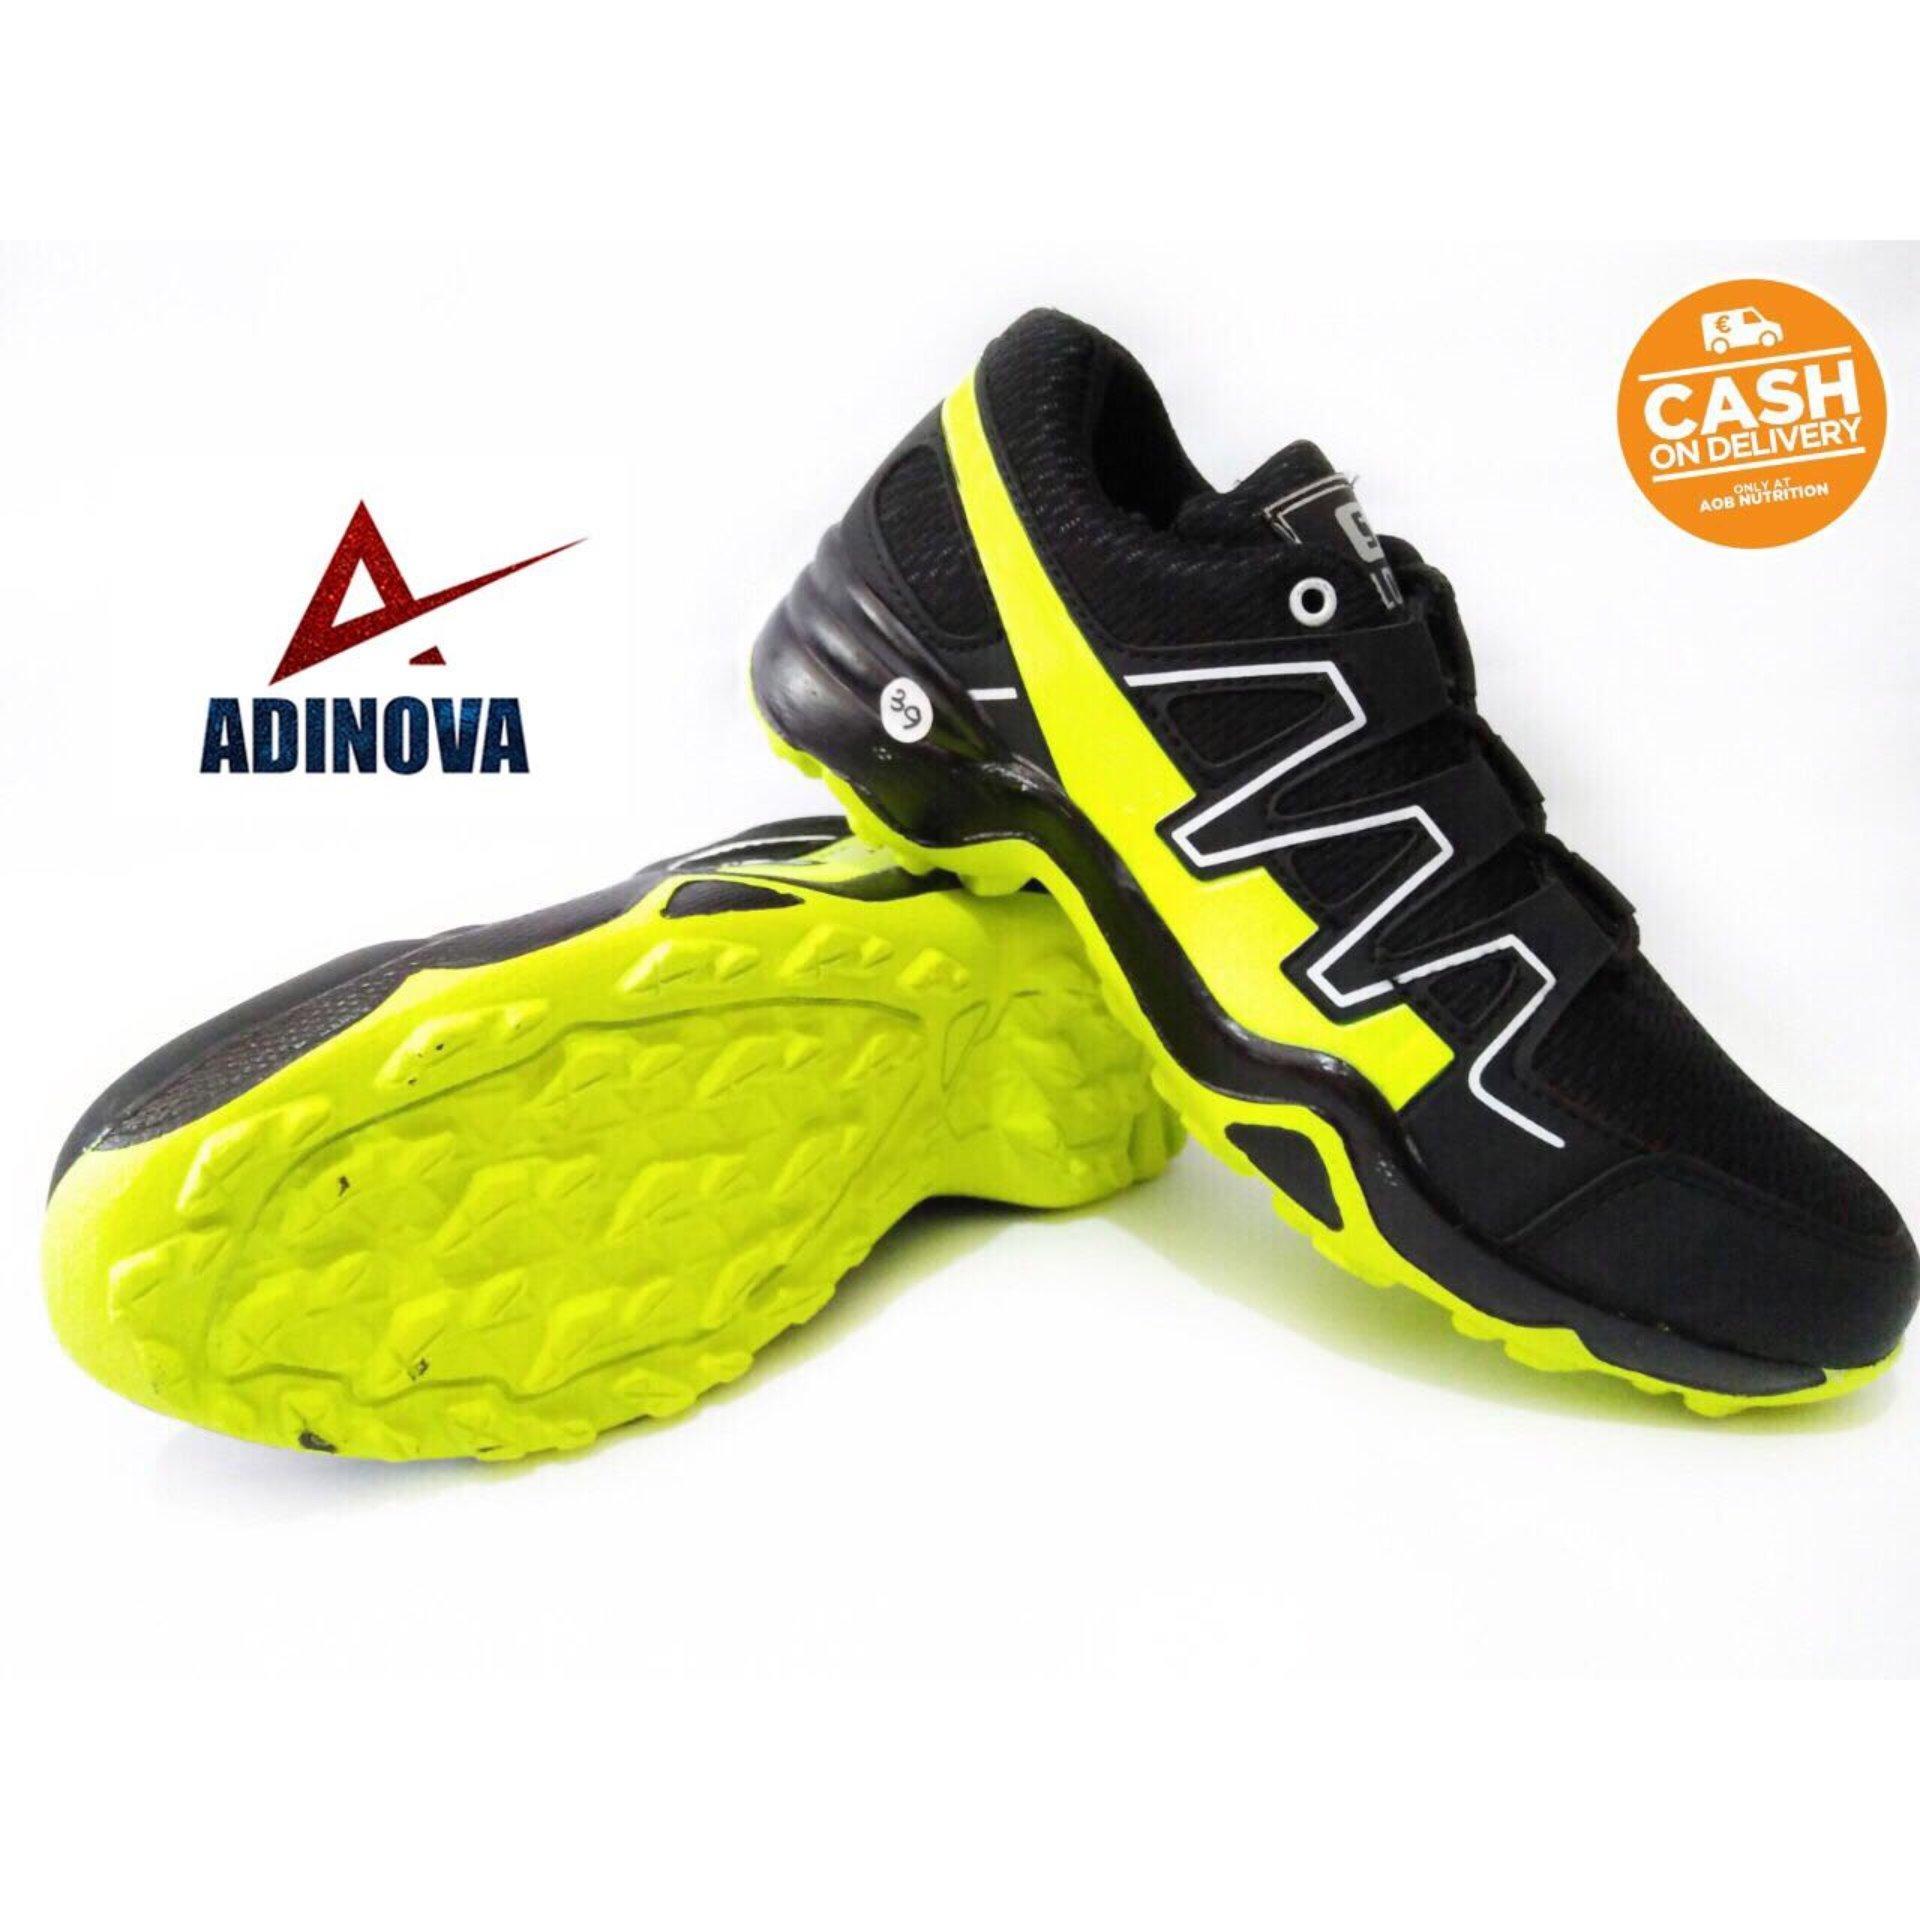 Adinova Shoes Sepatu Sport Solomo  Sepatu Olahraga   sepatu Gaya   Sepatu  Santai  Sepatu d7c689fb6b